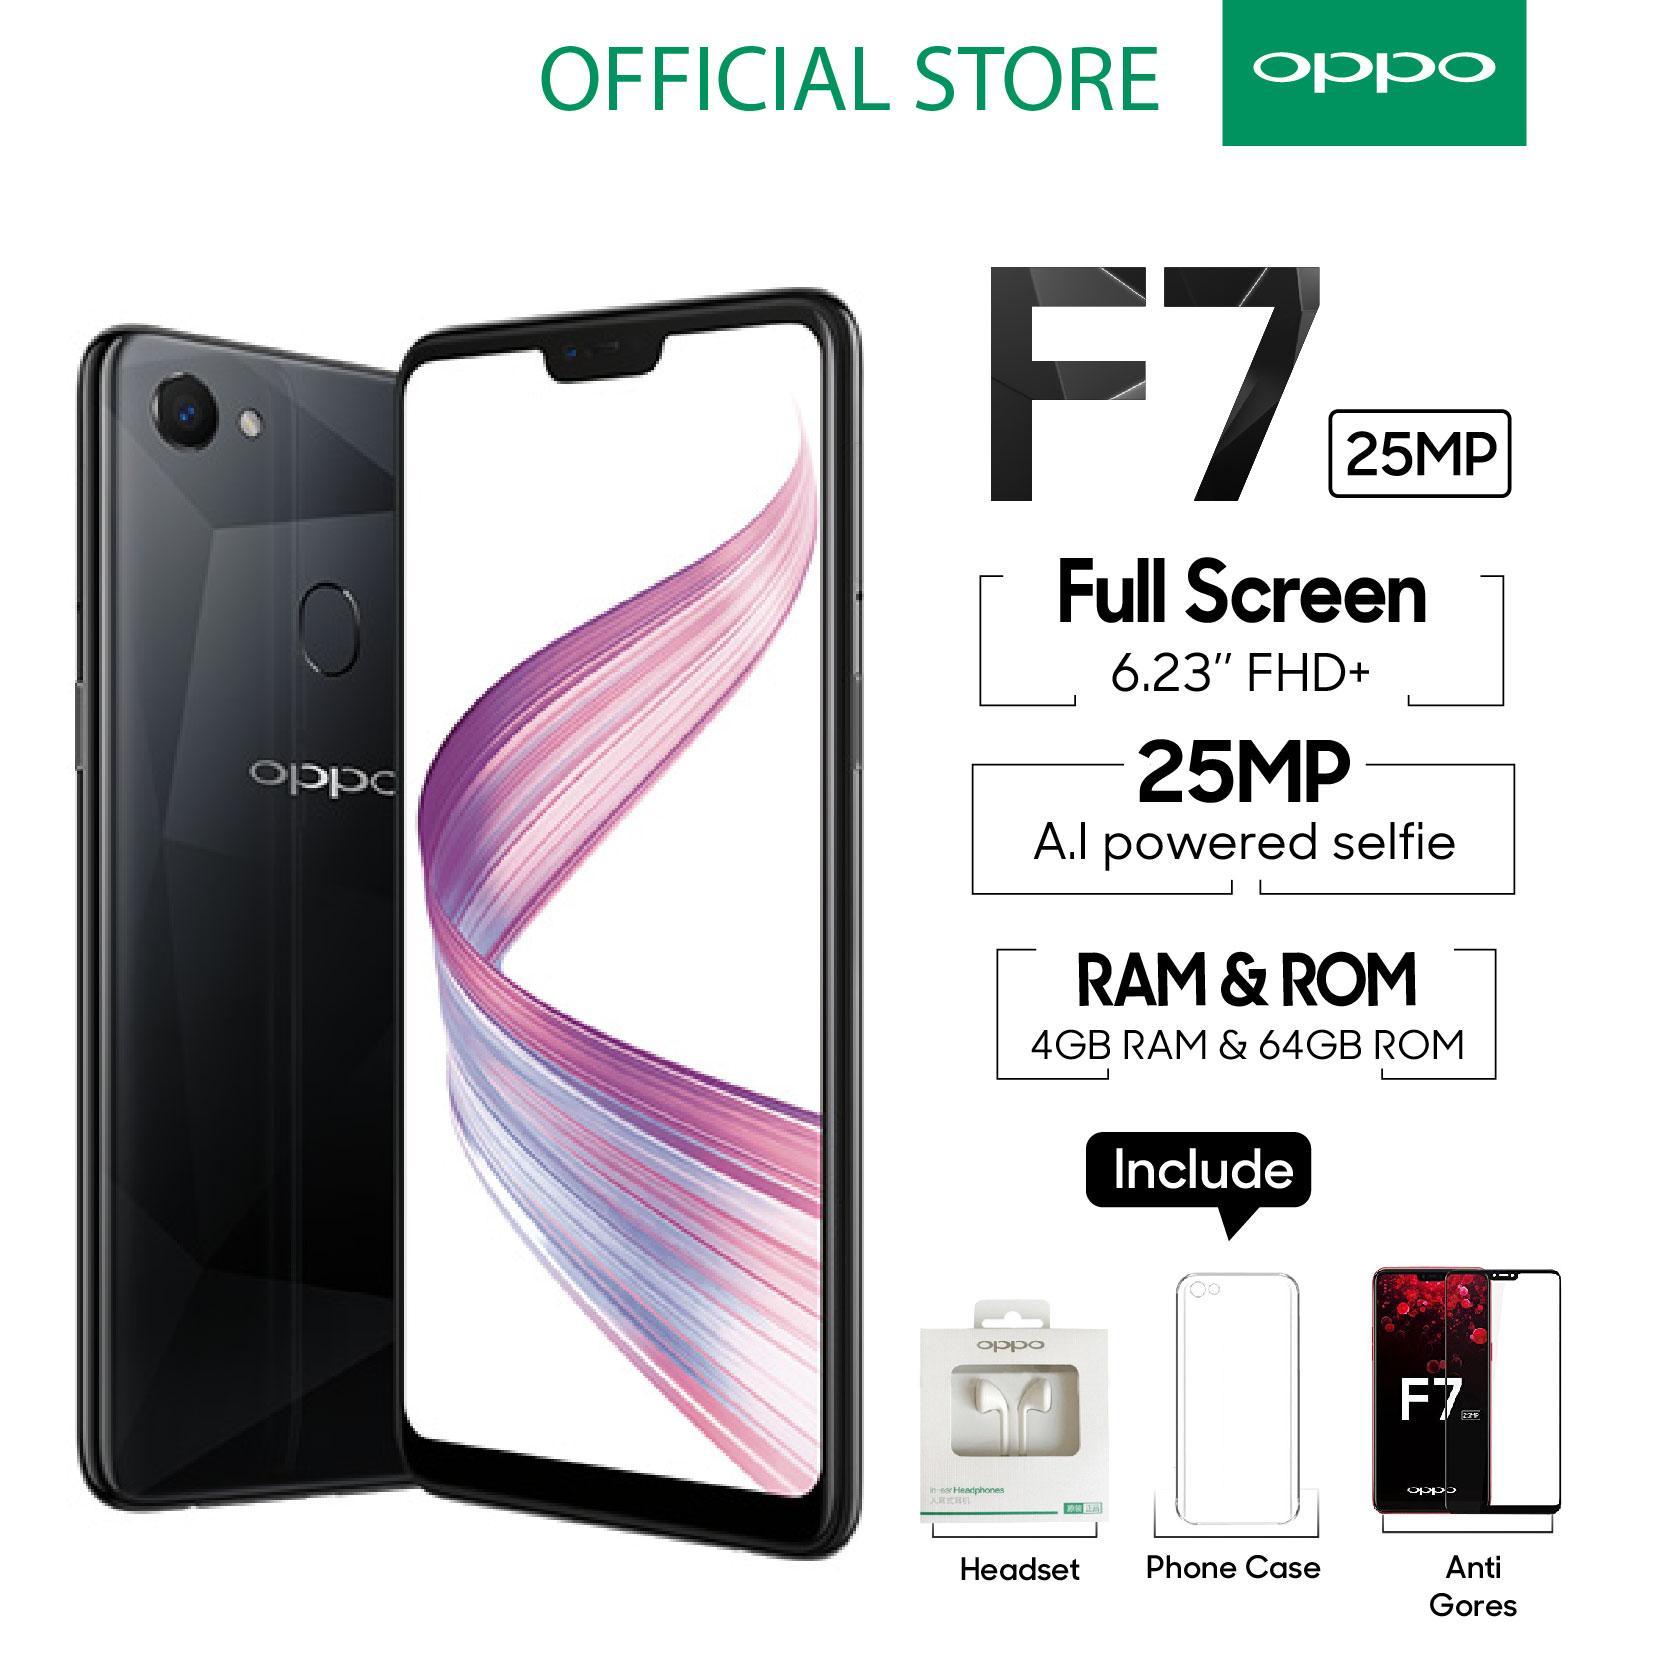 OPPO F7 SMARTPHONE 4GB/64GB Face Unlock, Al-Powered Selfie 25 MP (